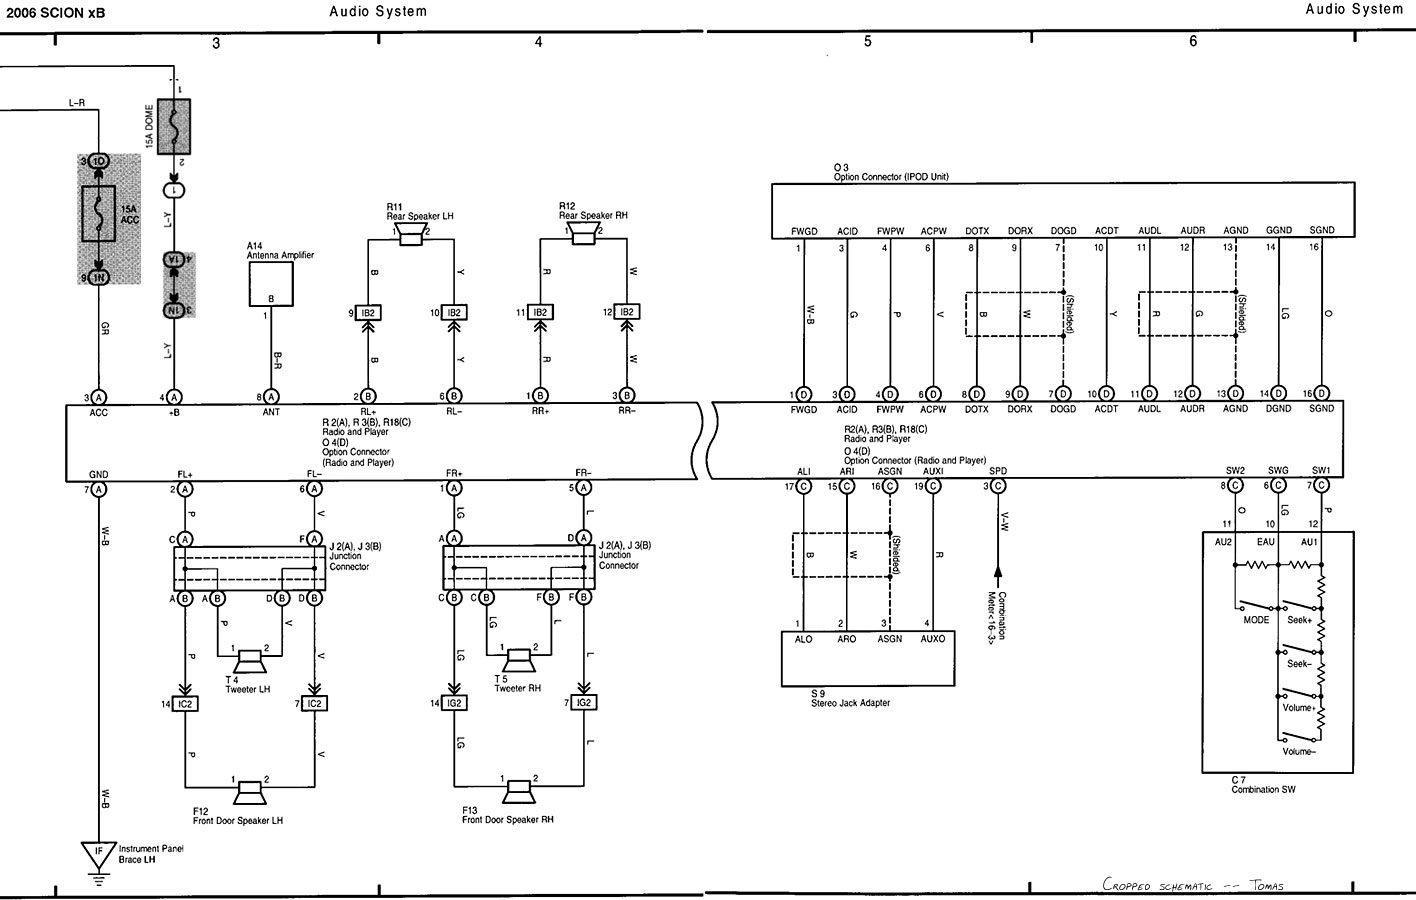 2005 scion tc radio wiring diagram?t\\=1508751668 100 [ jzz30 1jz gte wiring diagram wiring diagram and hernes Basic Electrical Wiring Diagrams at couponss.co